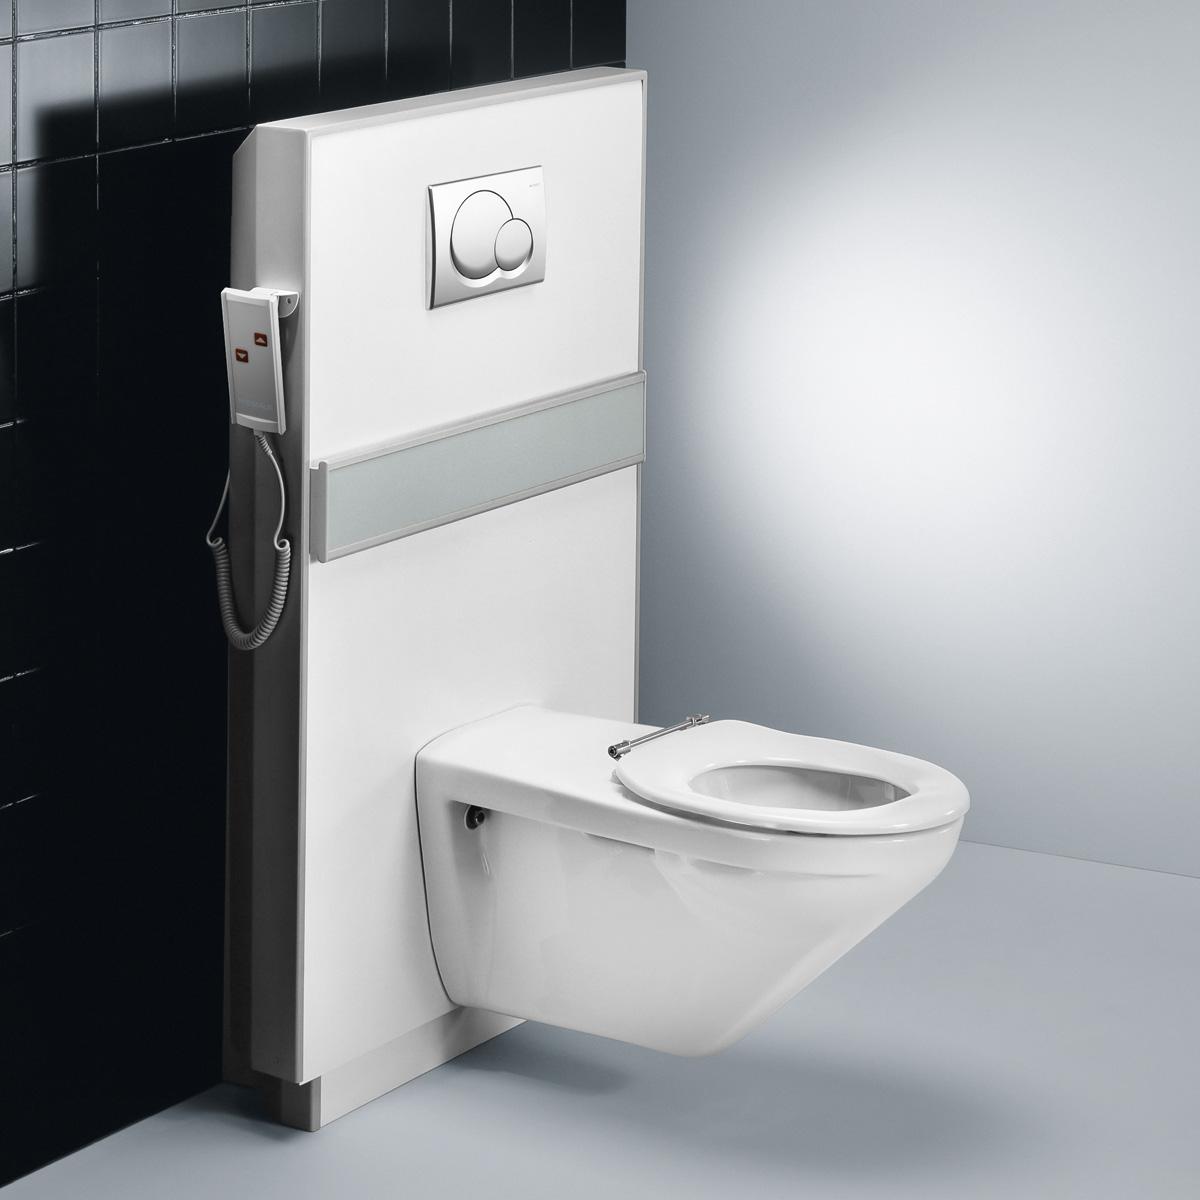 Assistdata Bracket For Toilet Height Adjustable